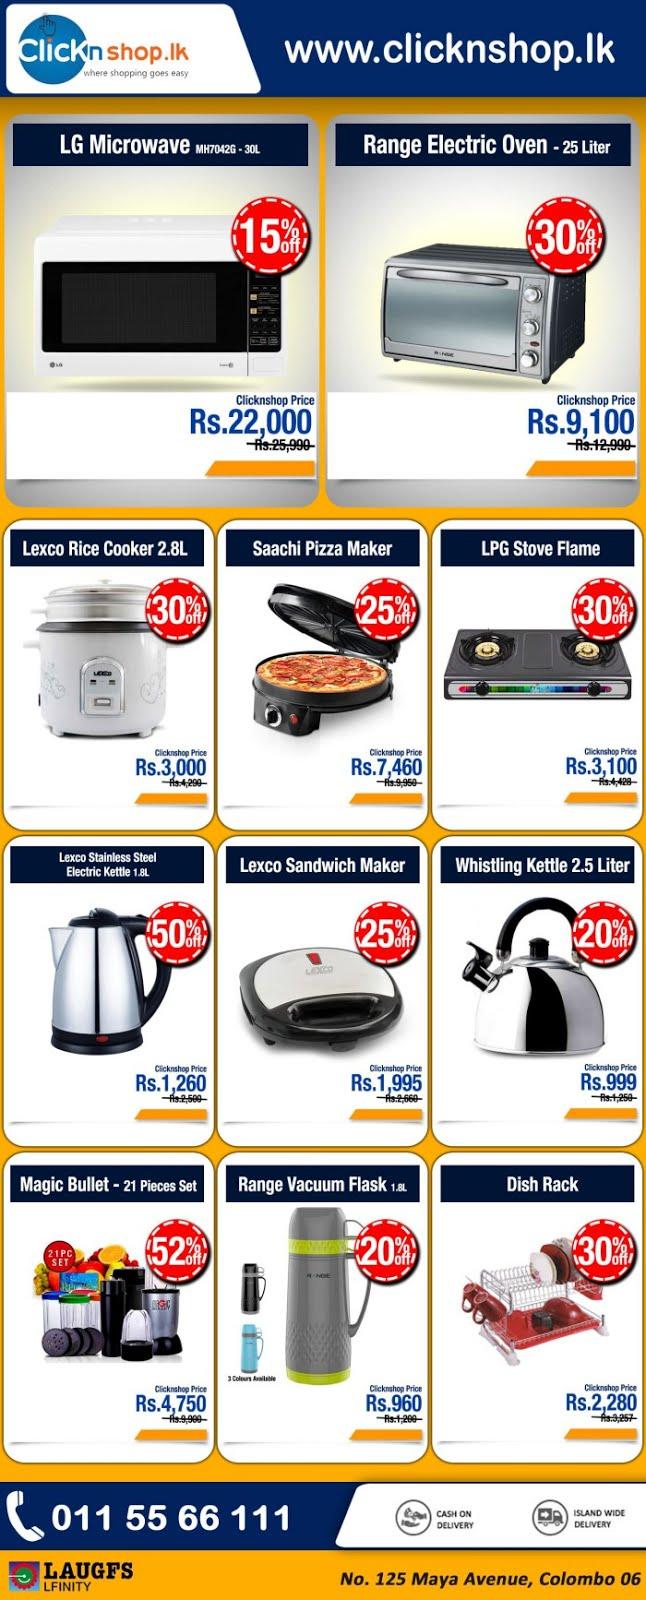 https://www.clicknshop.lk/kitchen-appliances/kitchen-gadgets.html?utm_source=DailyMail&utm_medium=Eflyer&utm_campaign=AUG04DM